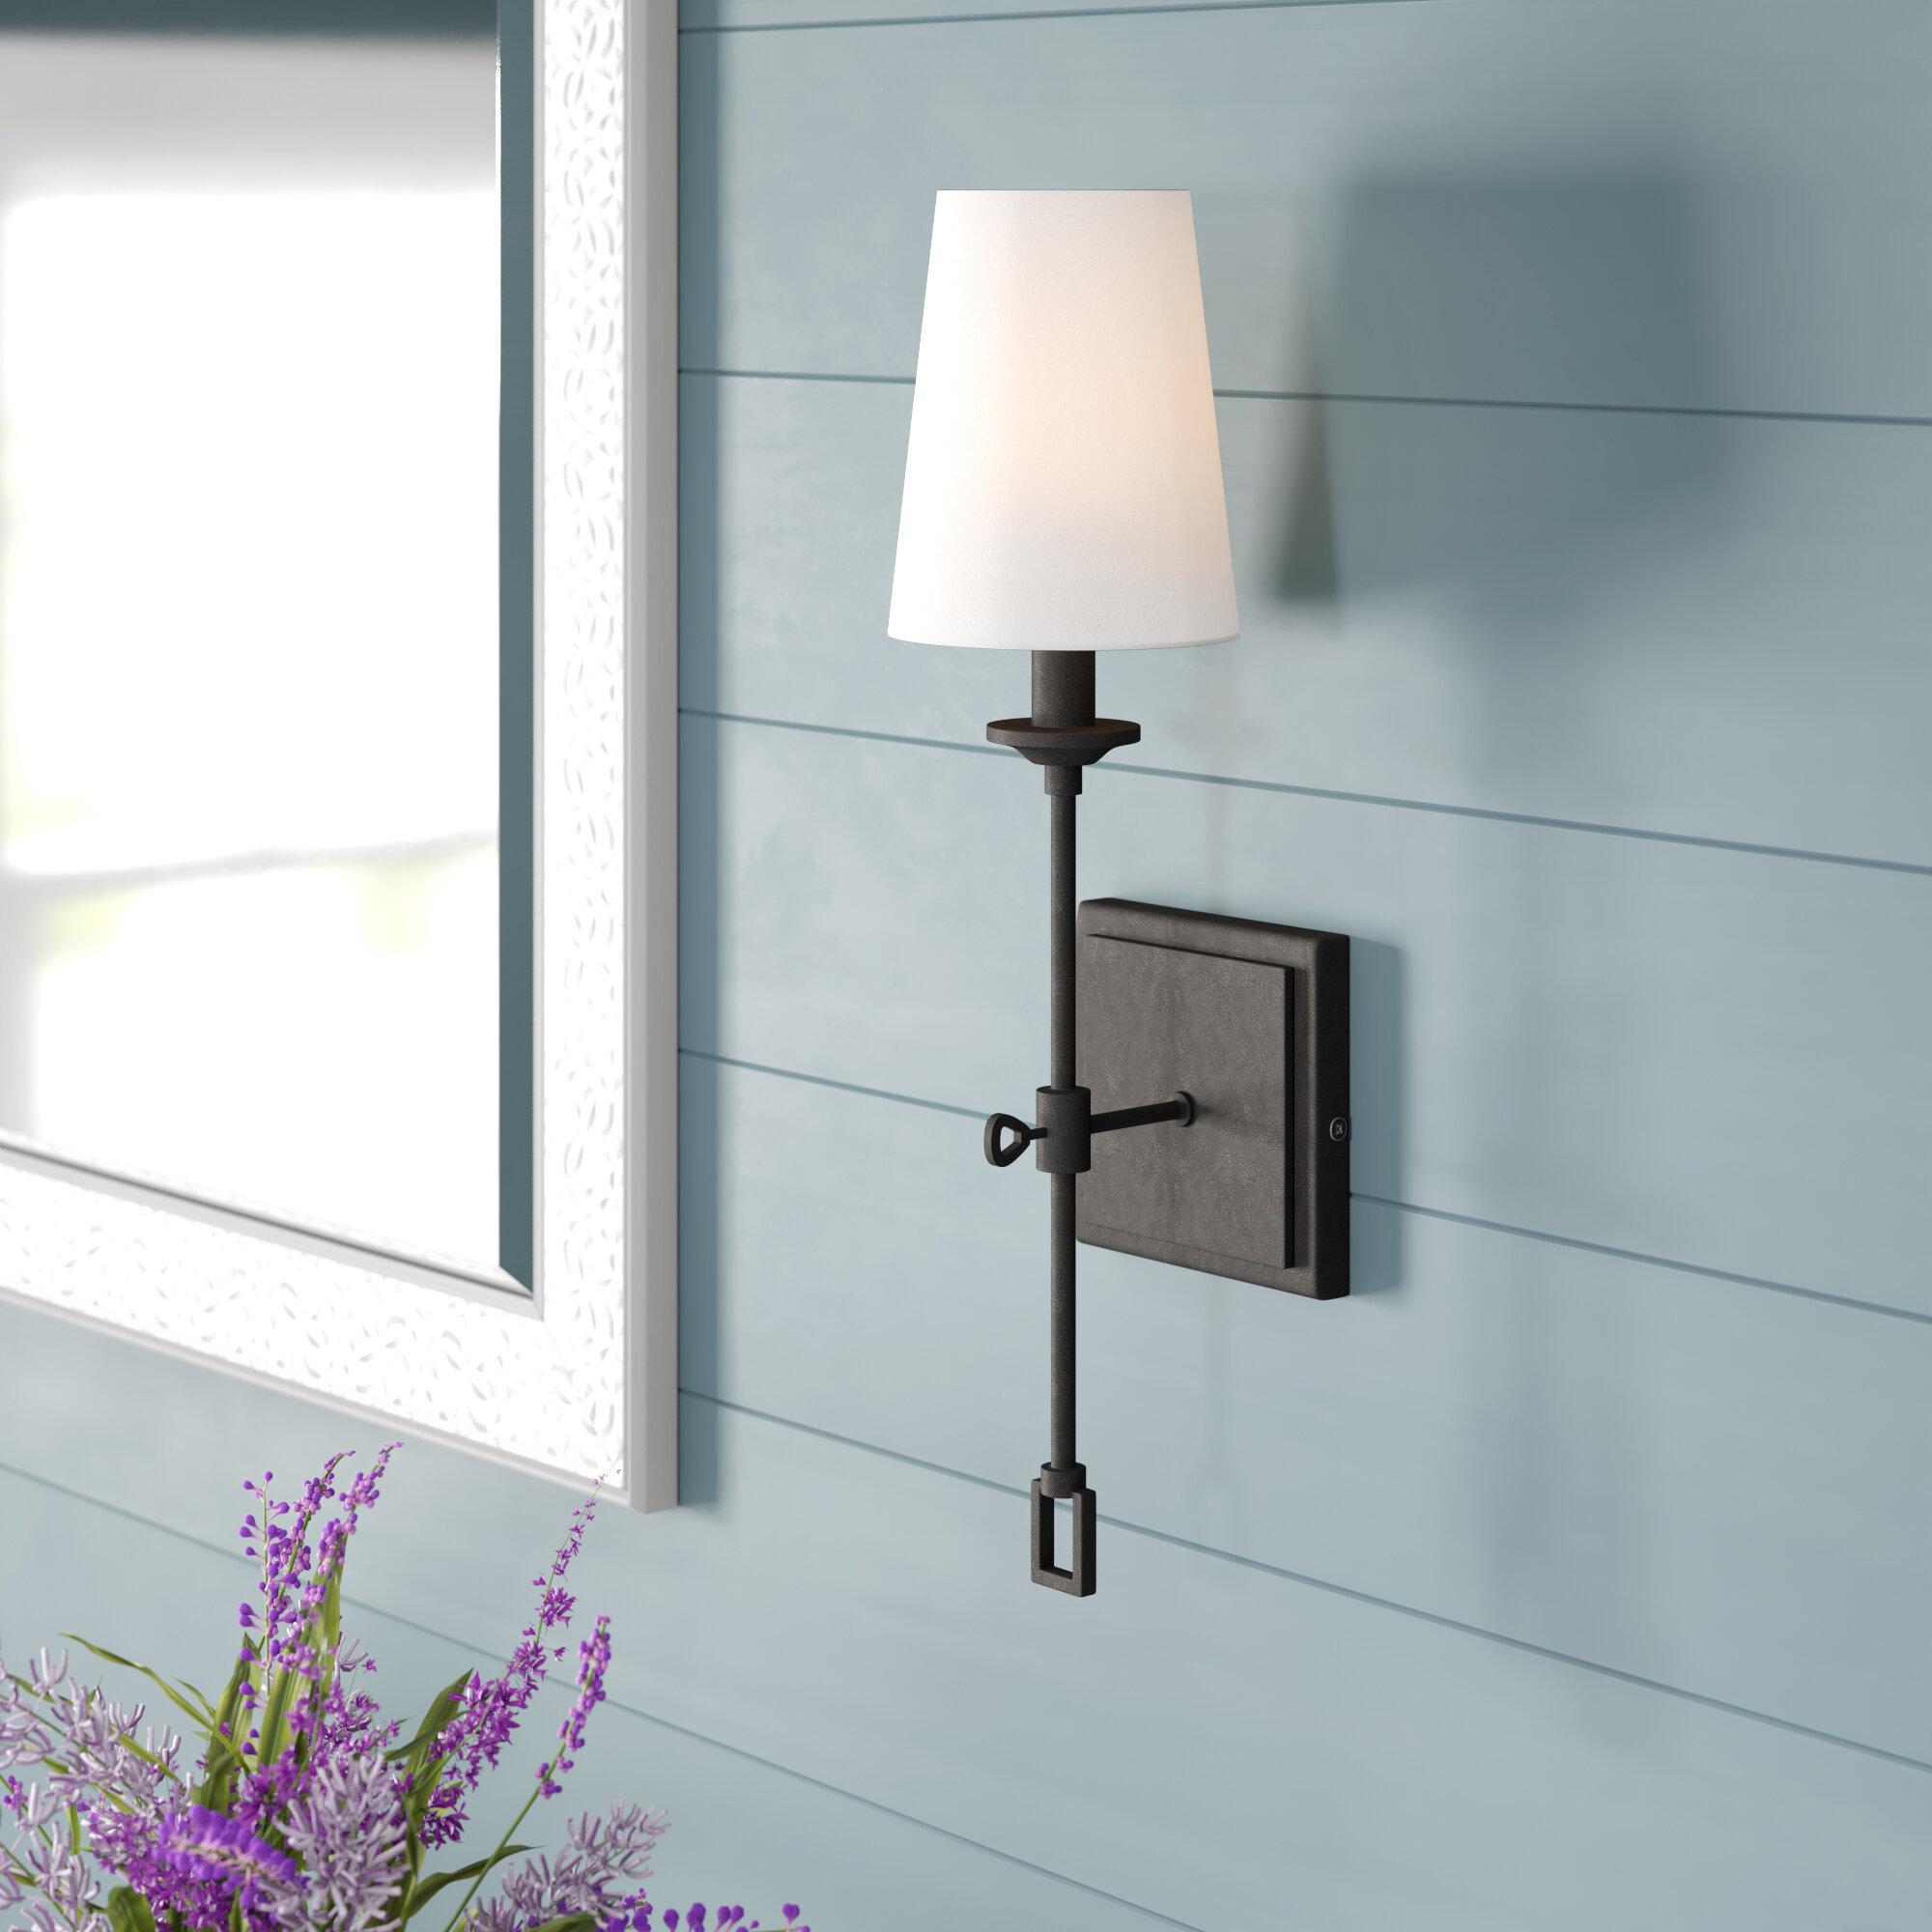 Laurel Foundry Modern Farmhouse Lorainne 1 Light Wall Sconce Reviews Wayfair